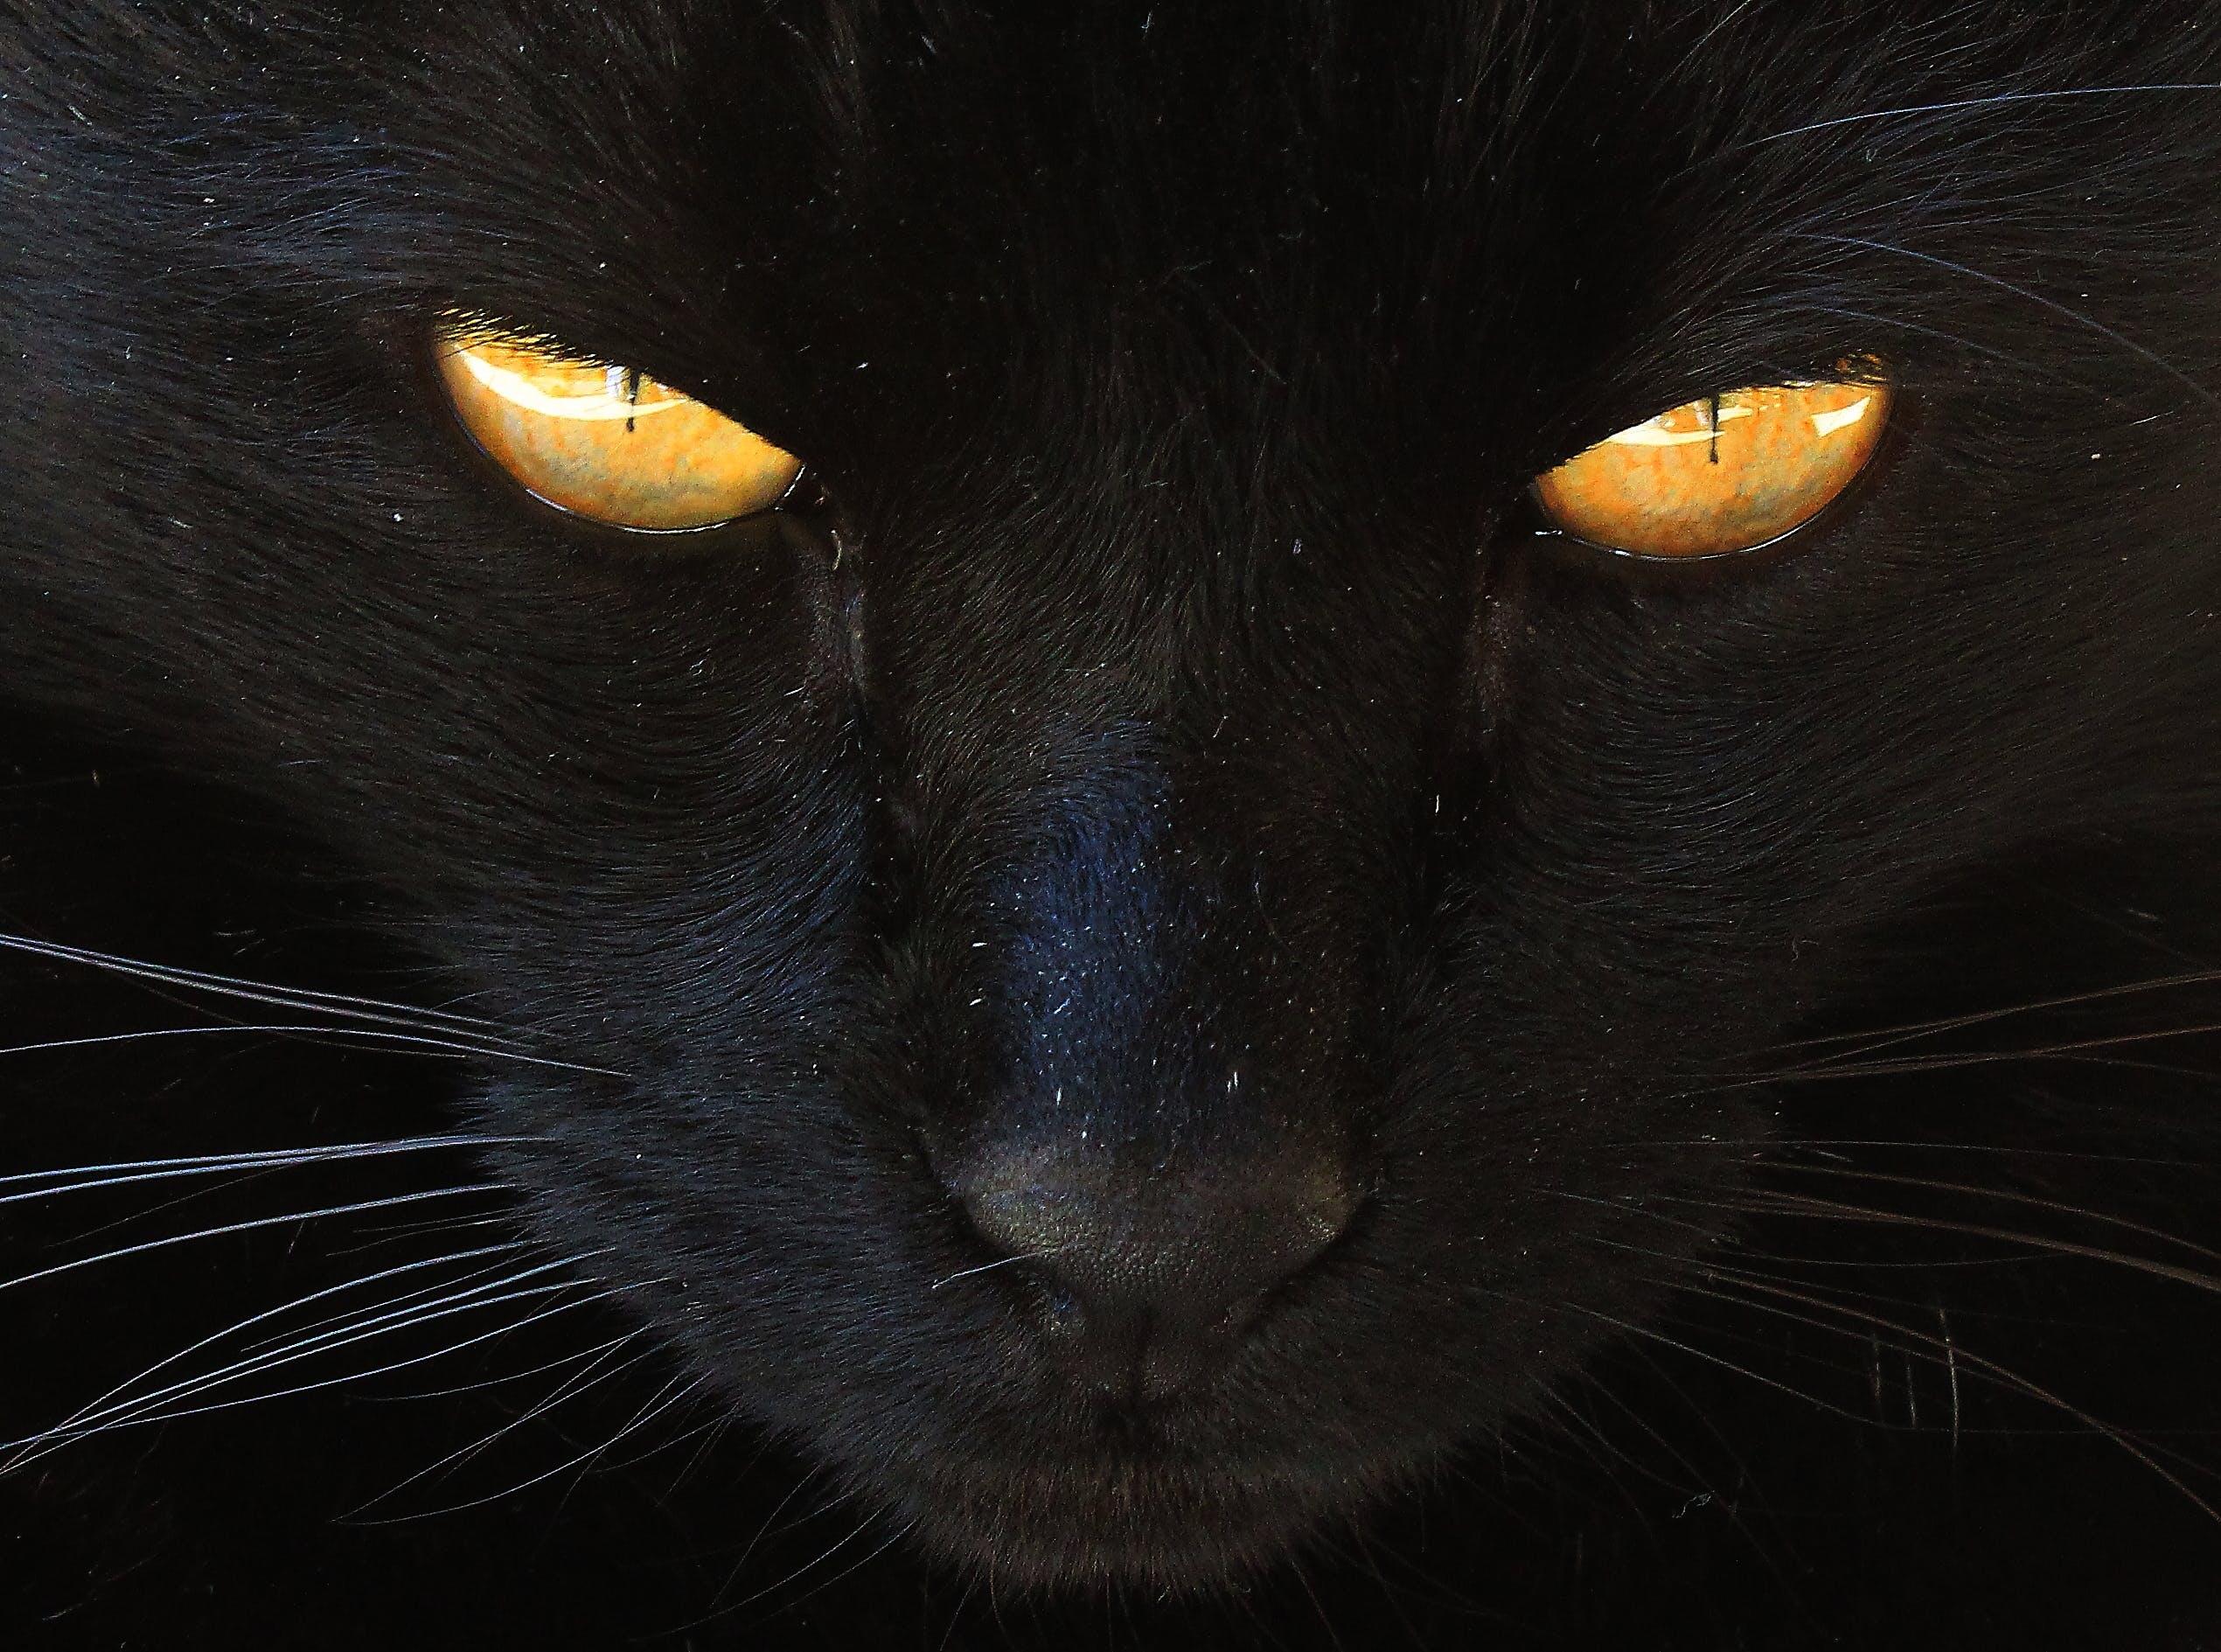 Free stock photo of cat, cats eyes, yellow eyes